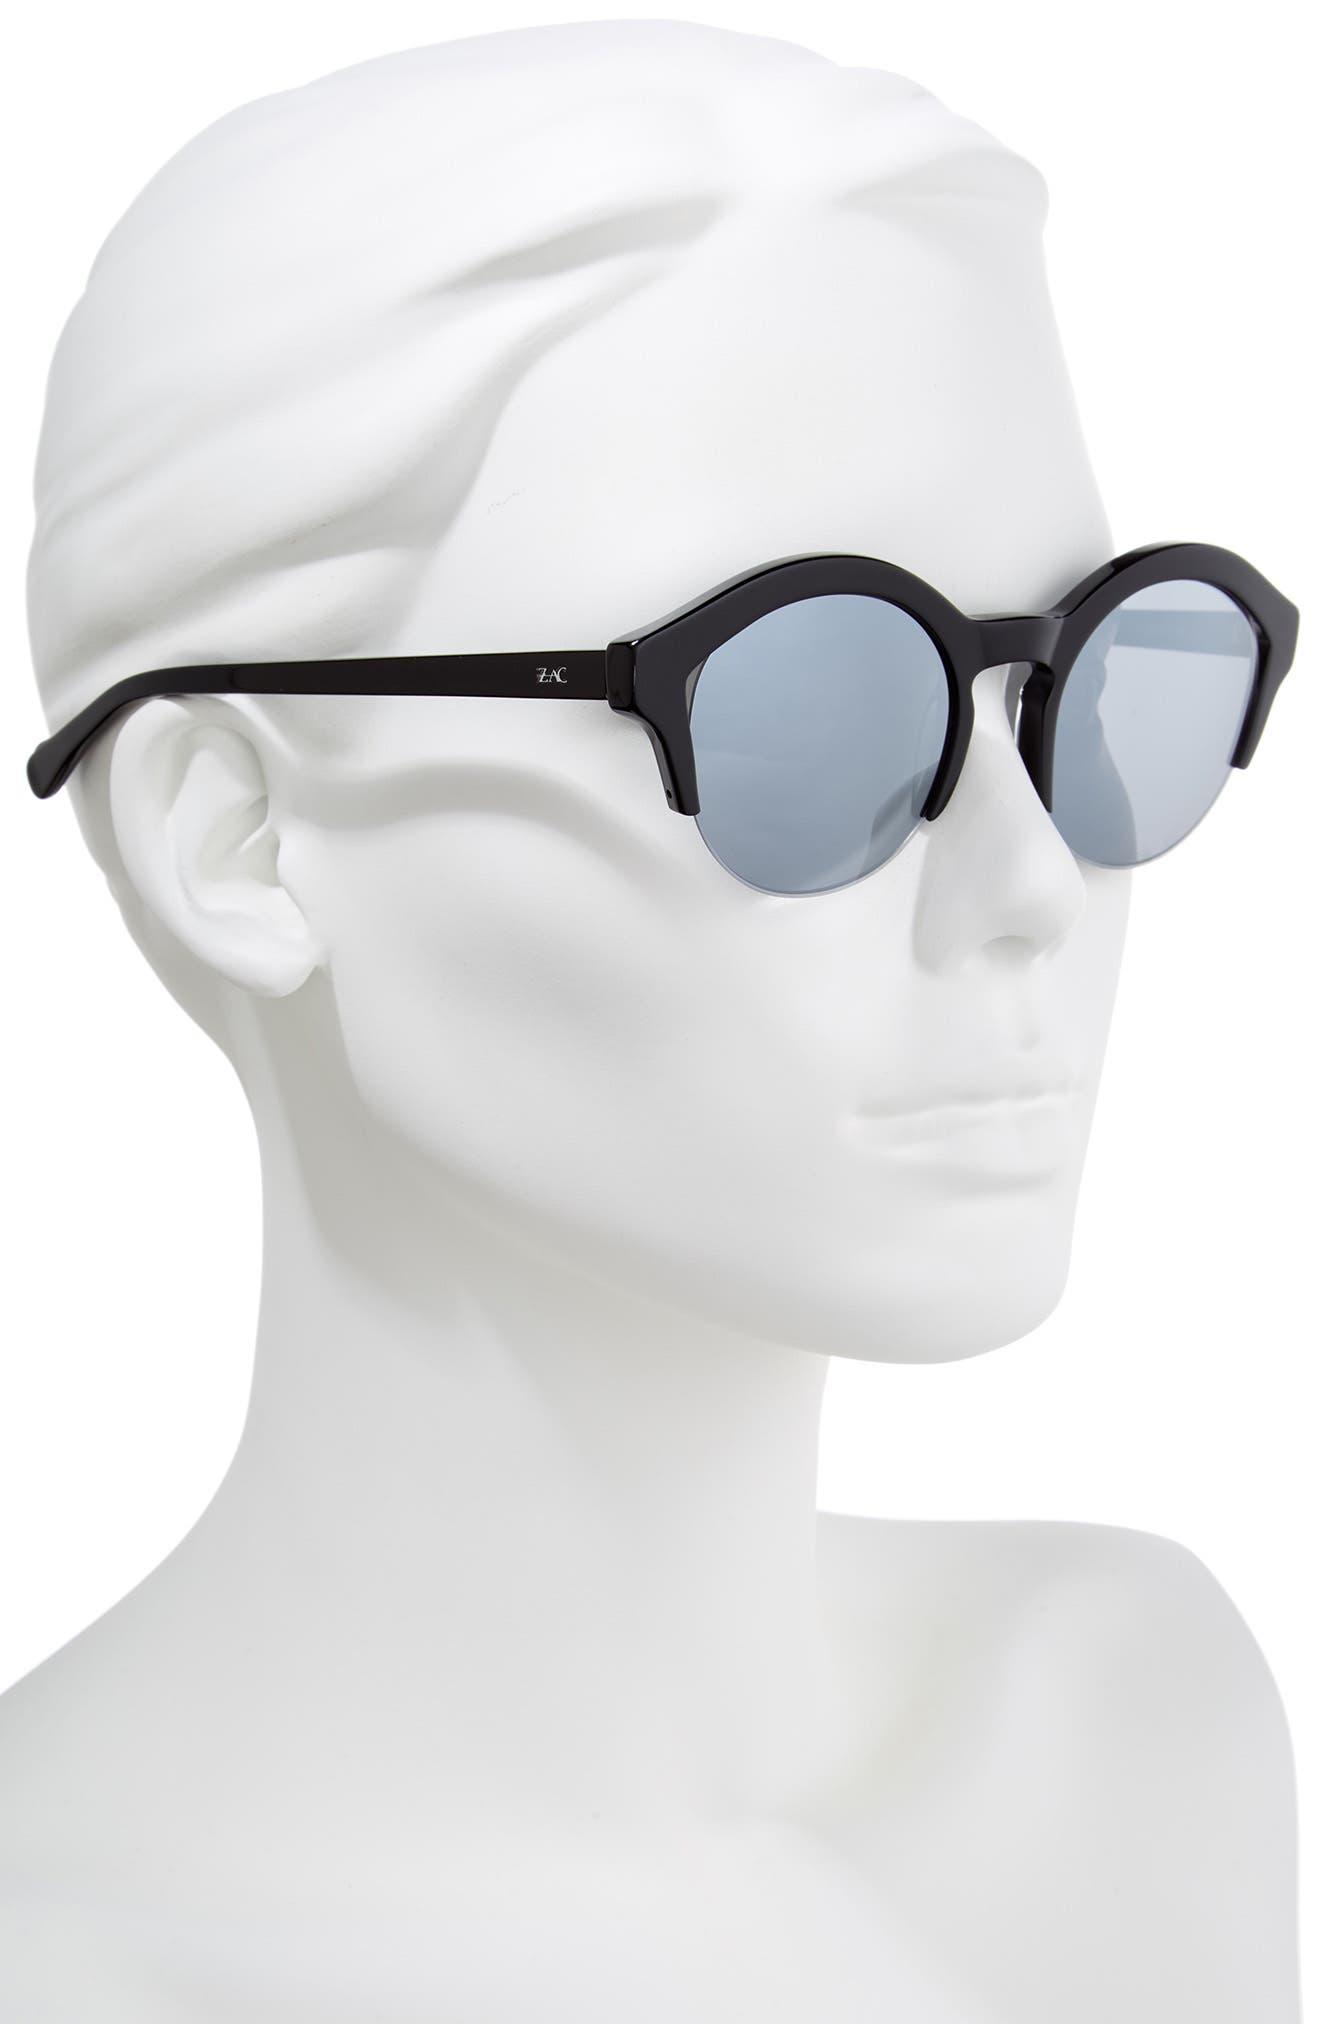 Bren 51mm Half-Rim Sunglasses,                             Alternate thumbnail 2, color,                             BLACK/ SILVER